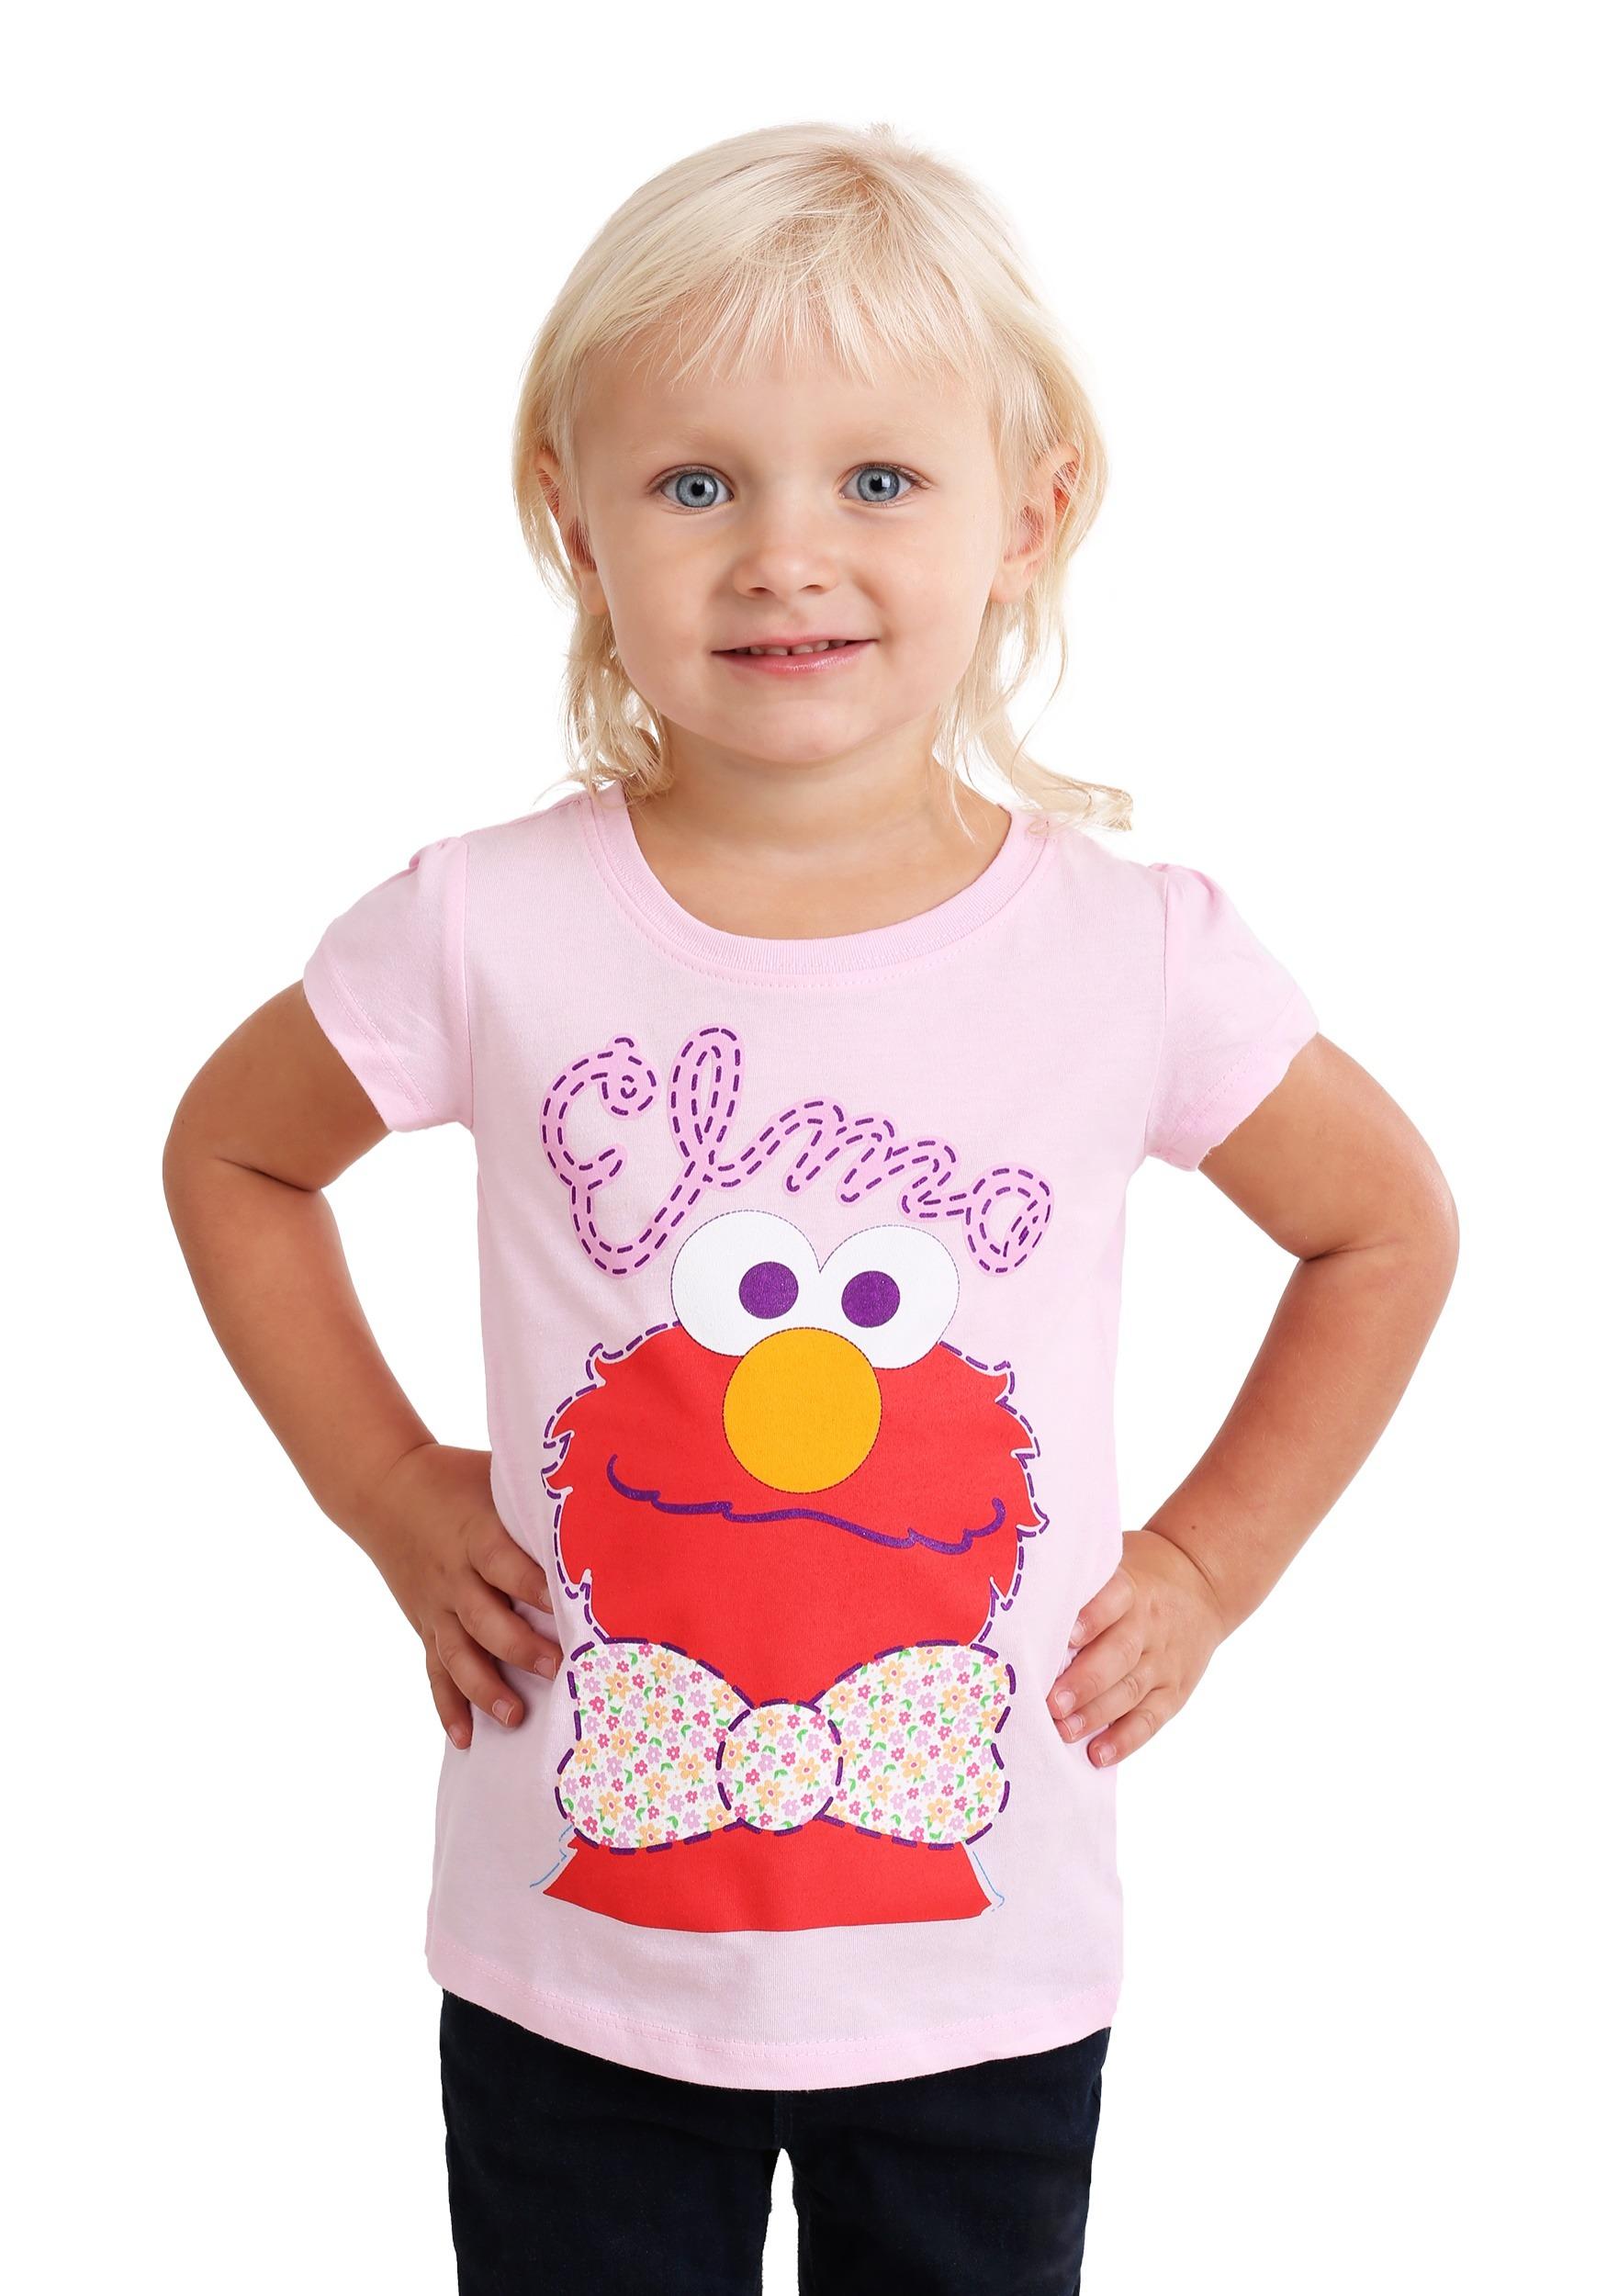 57c3ef9c8a8 Girl s Toddler Sesame Street Elmo with a Bowtie T-Shirt